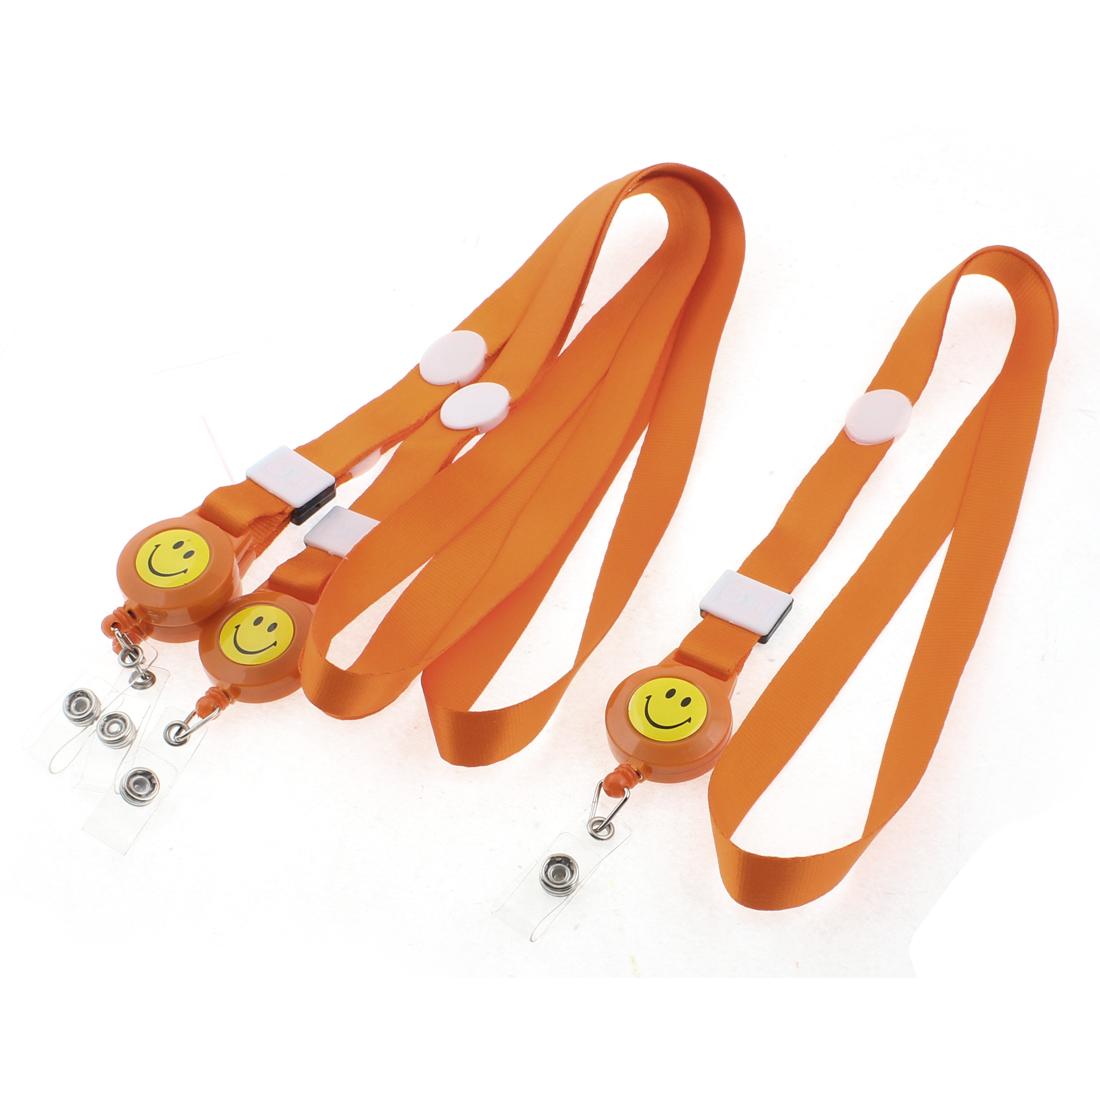 Smile Face Pattern Name Company Position ID Card Holder Neck Strap Orange 4PCS